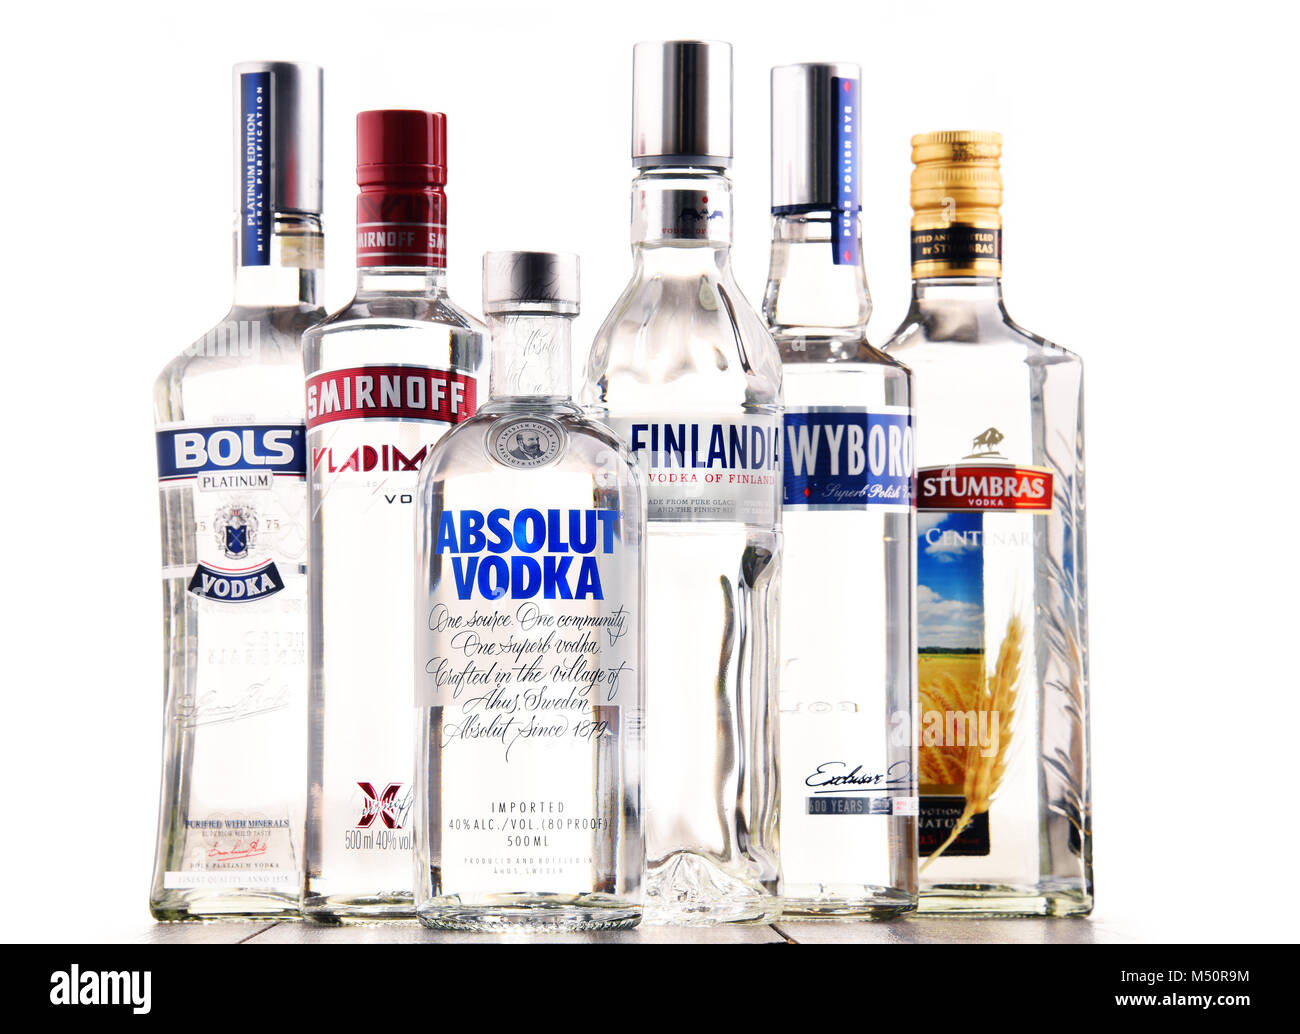 Bottles Of Assorted Global Vodka Brands Stock Photo 175195264 Alamy